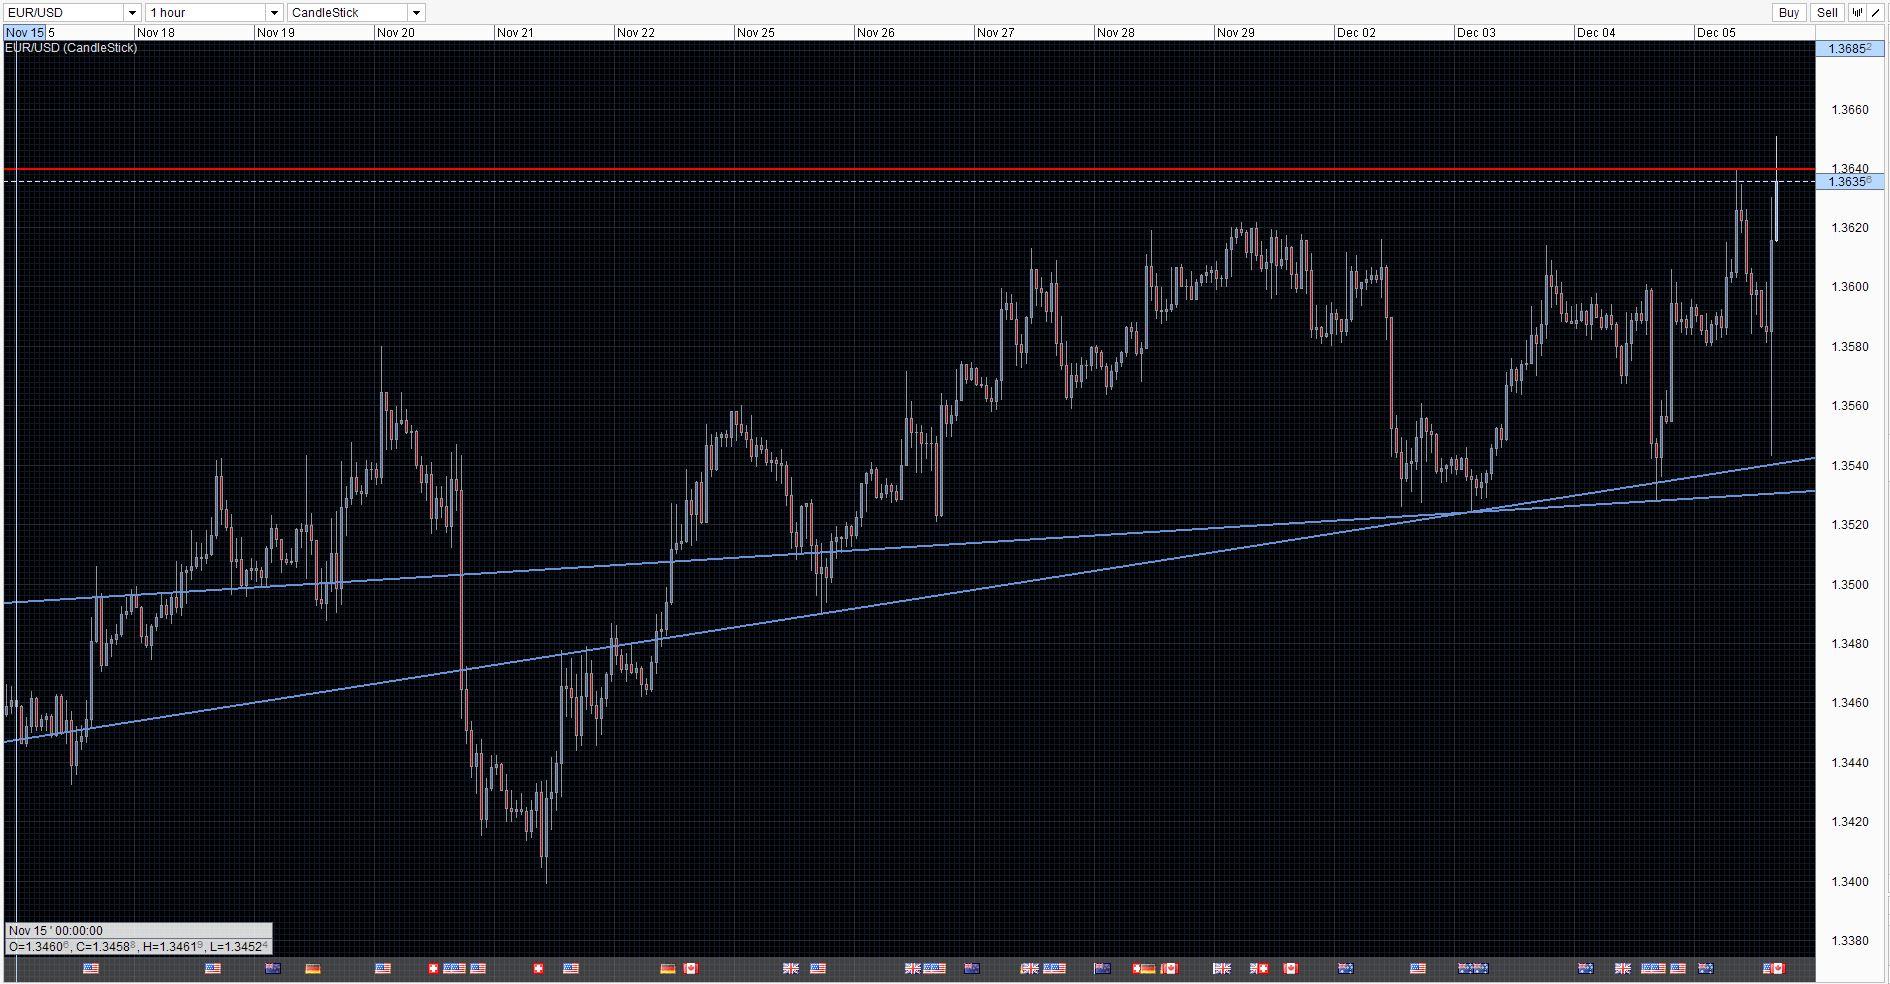 EUR/USD Chart 05/12/2013